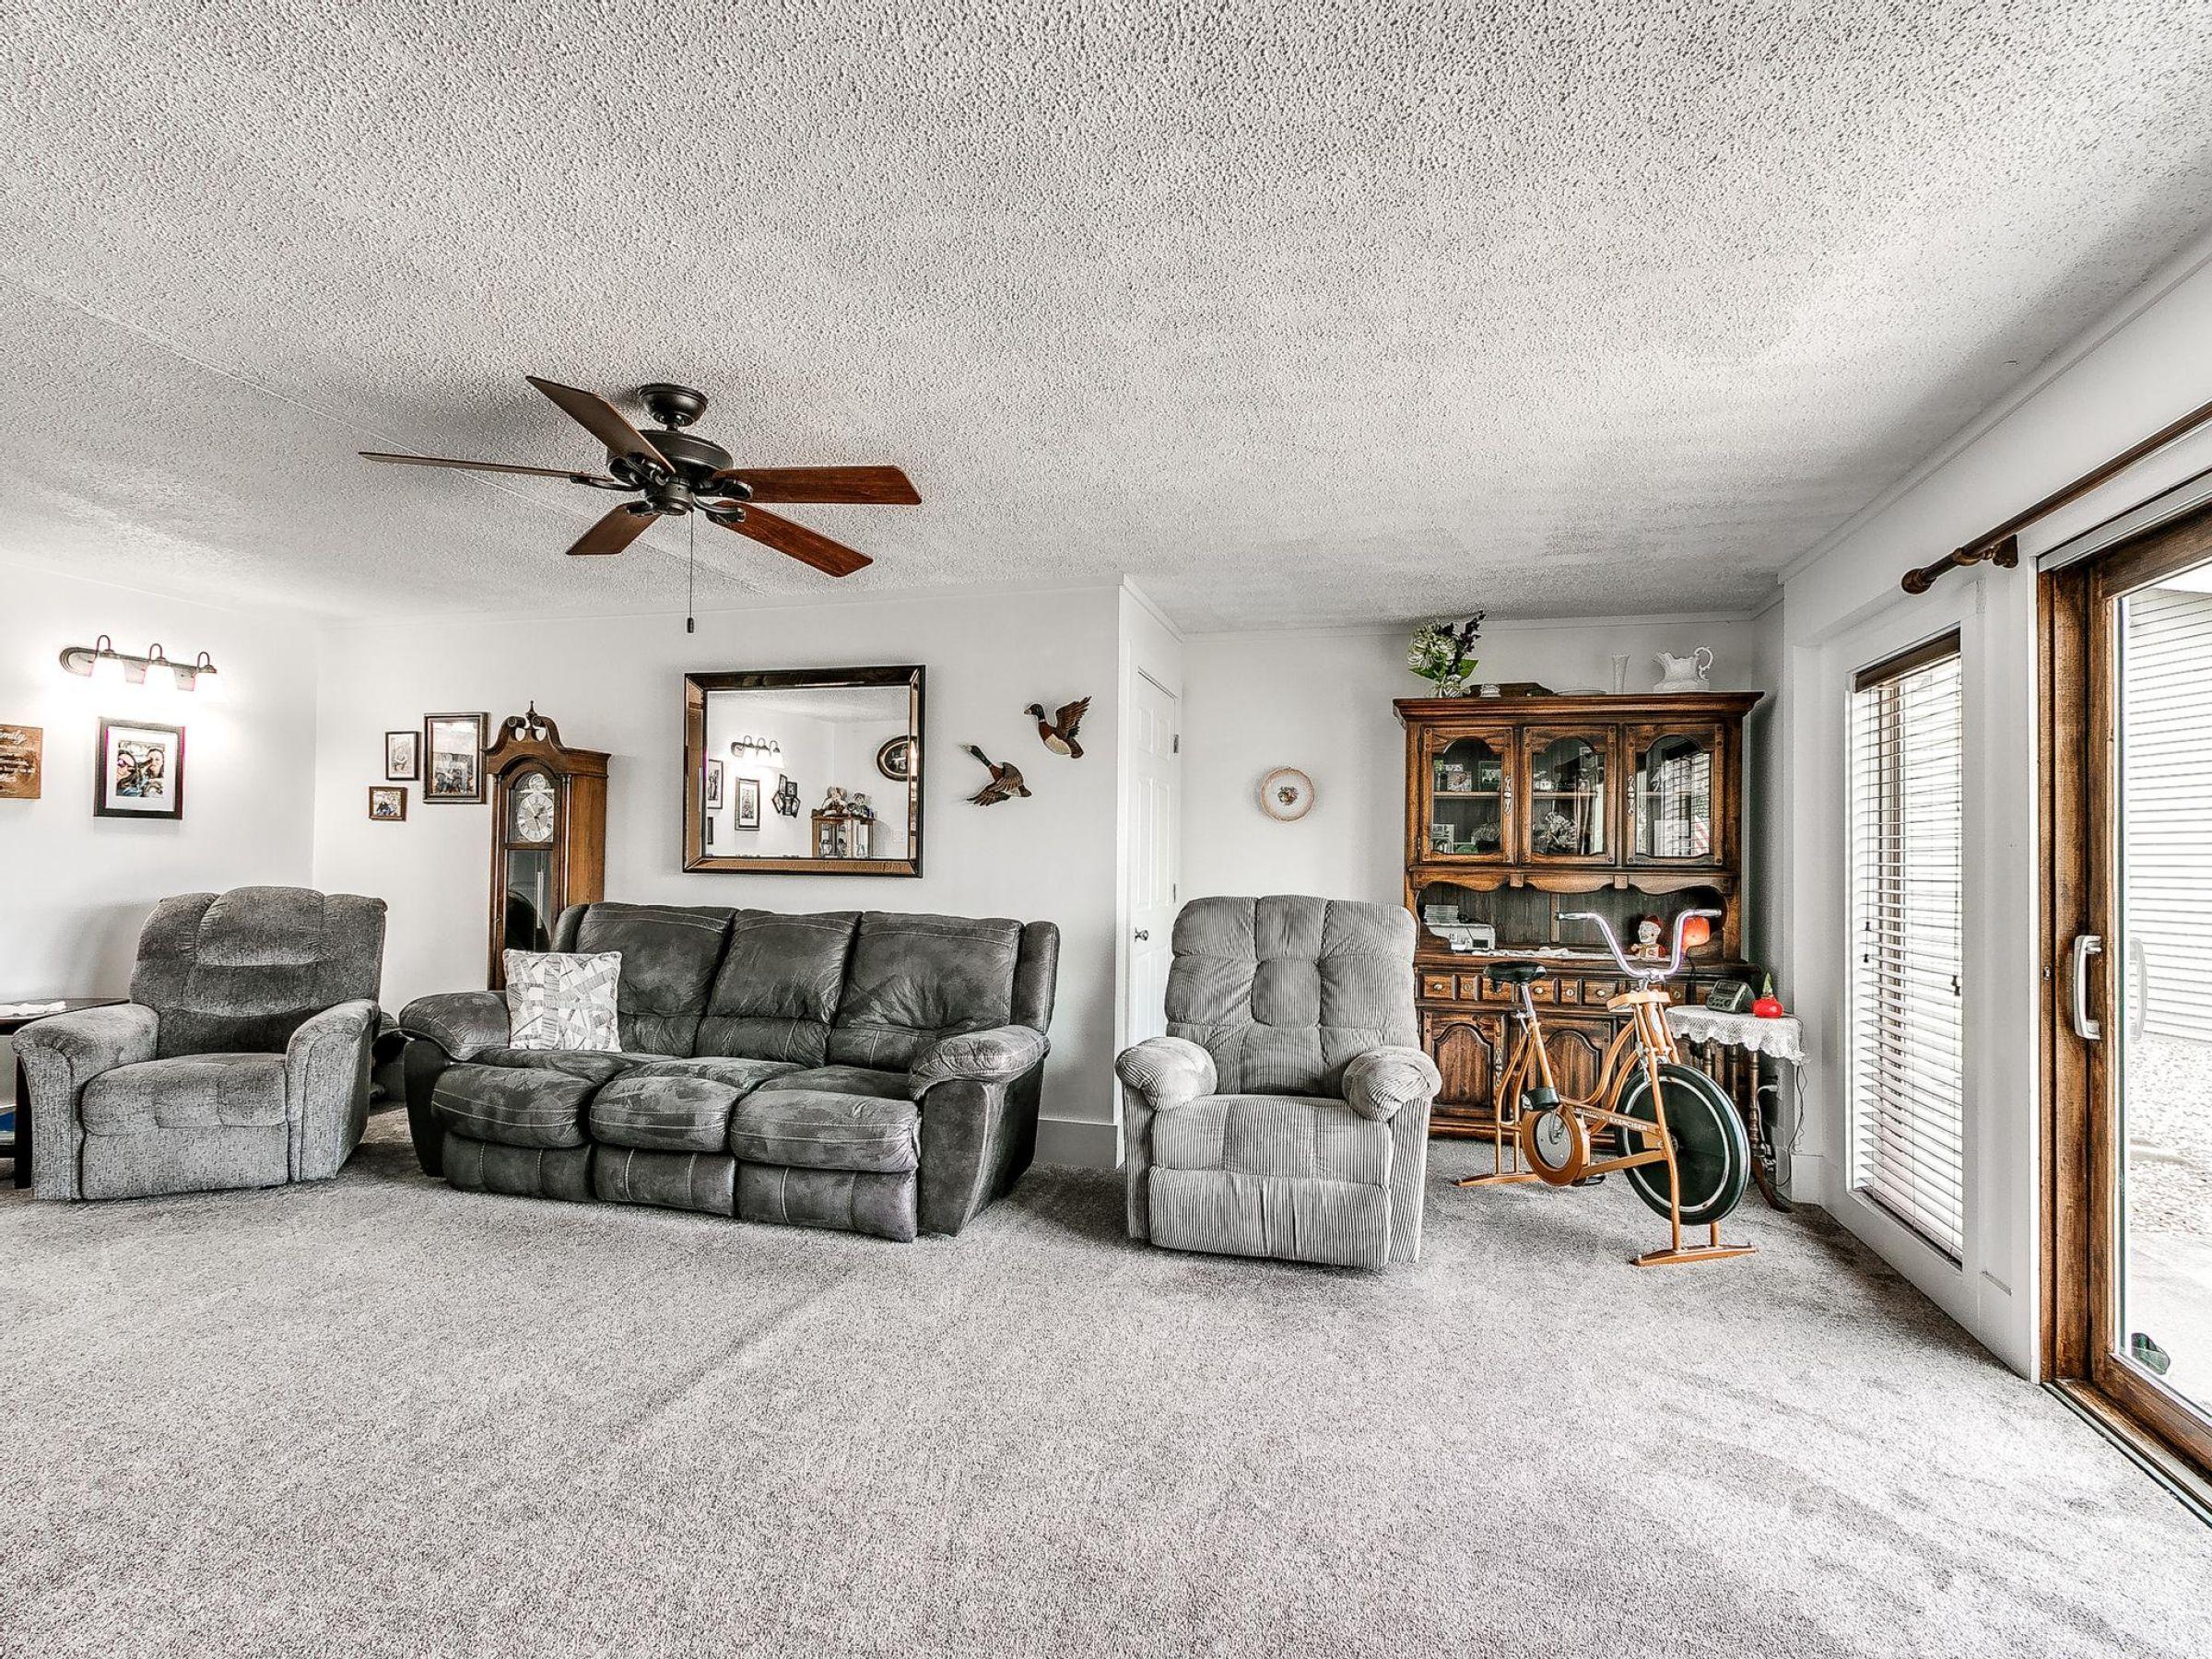 residential-warren-county-iowa-3-acres-listing-number-15593-4-2021-06-18-154729.jpg